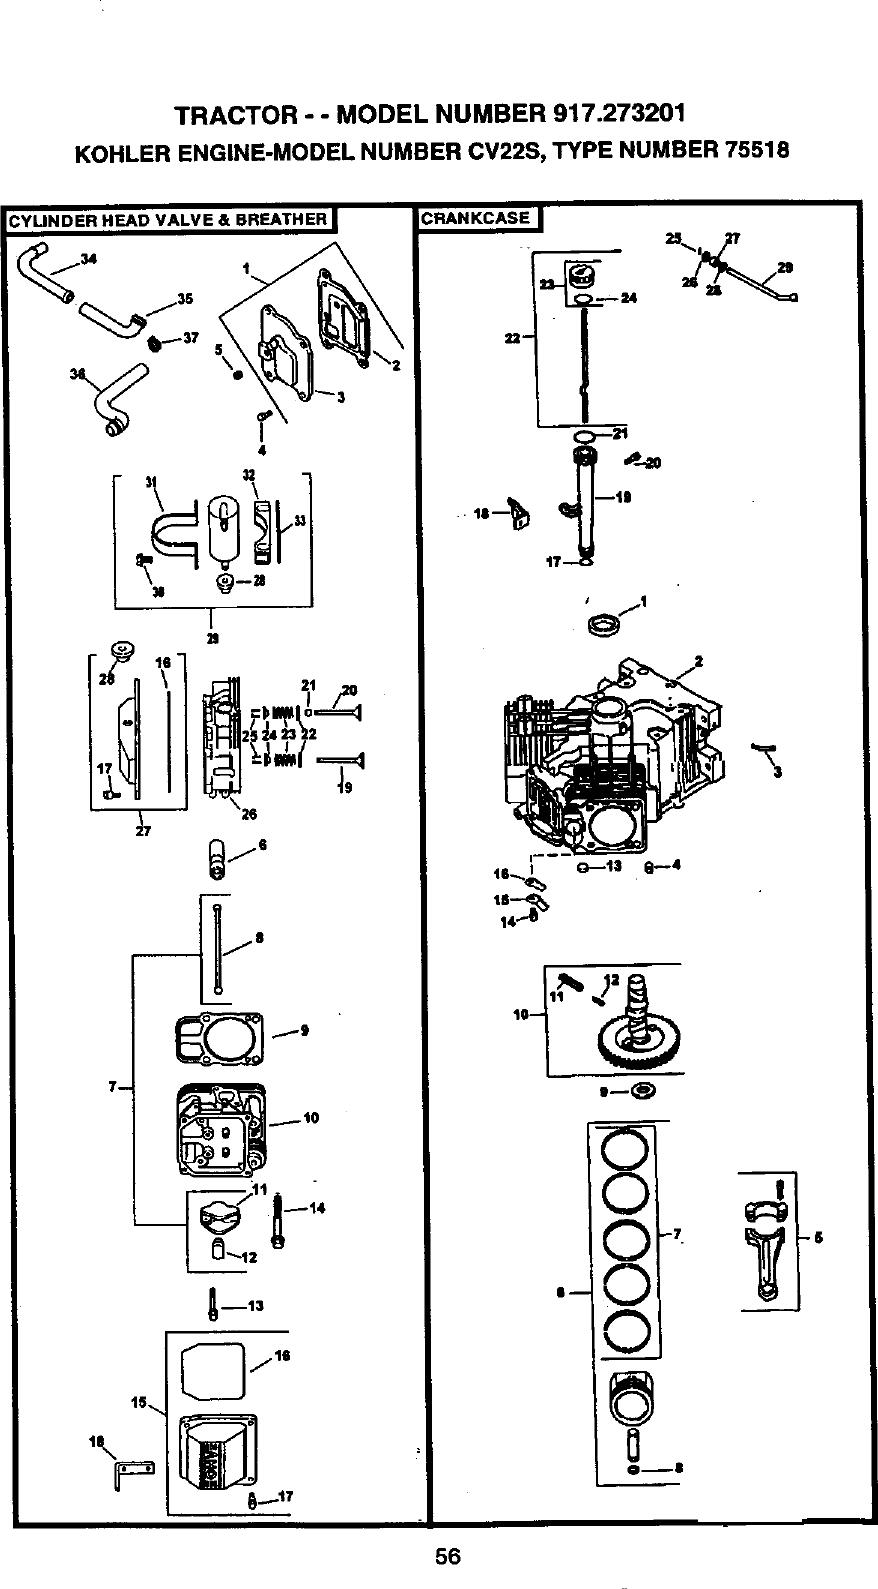 Kohler Engine Schematic Diagrams Breather Hose  Small Engine